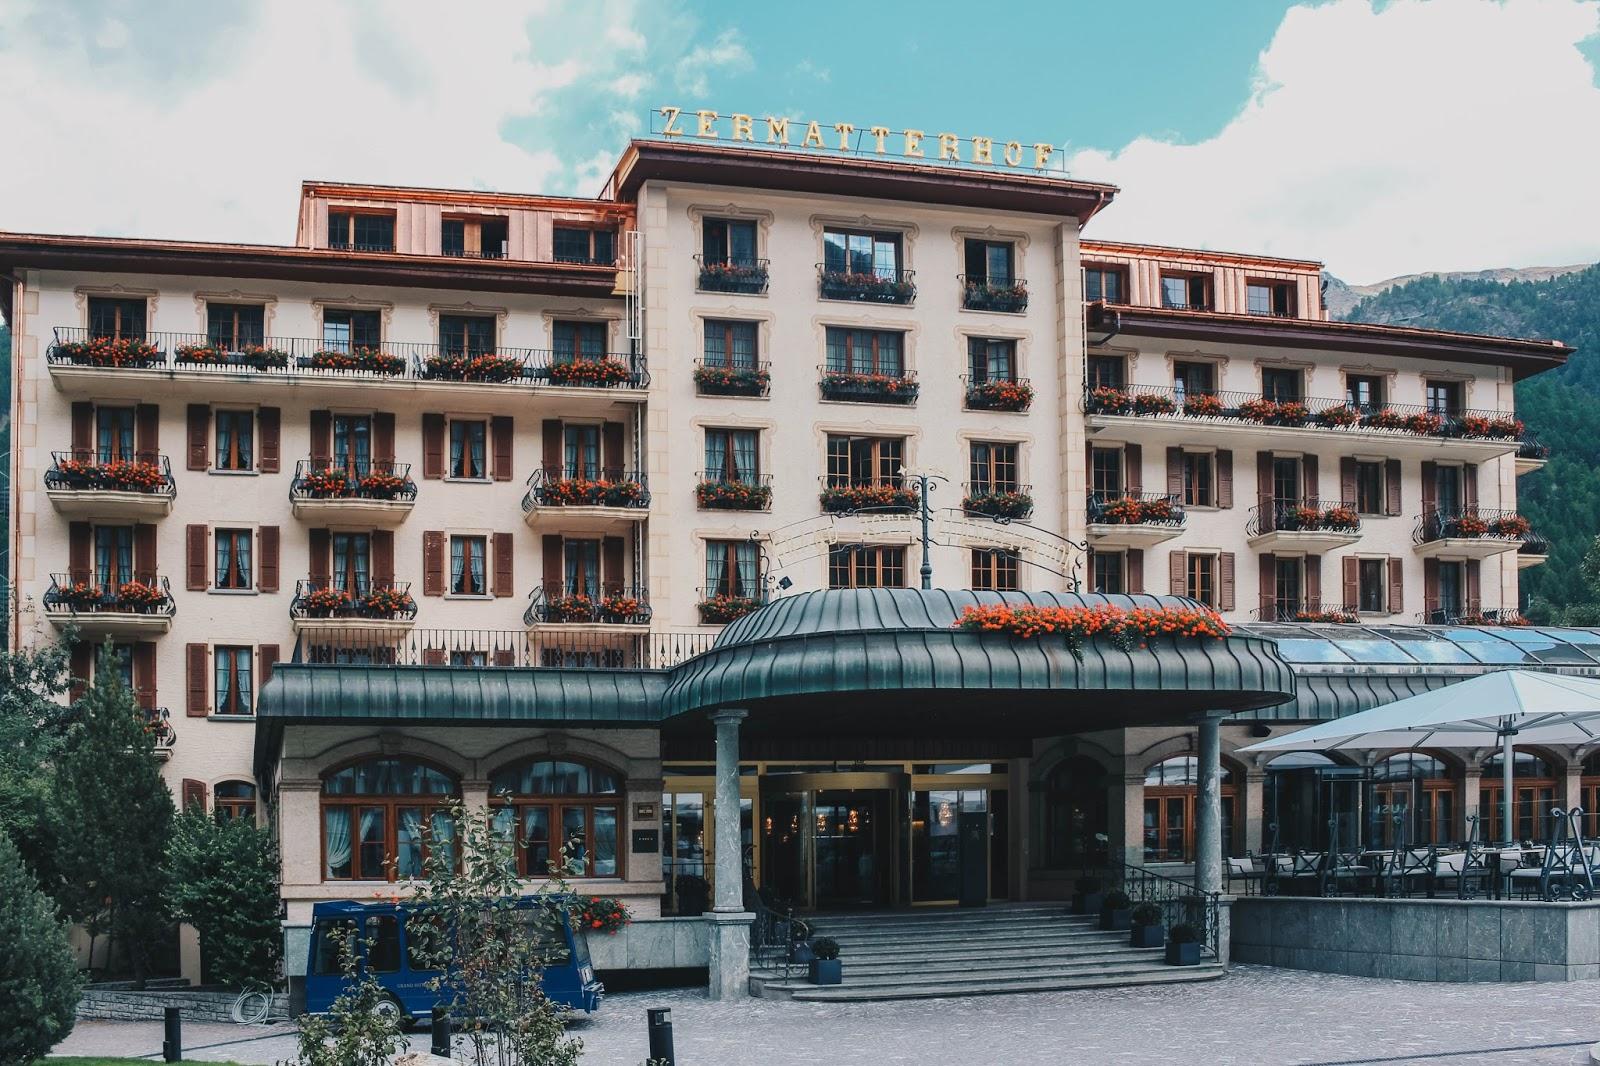 HOTEL - Grand Hotel Zermatterhof | Fashion Whisper | Bloglovin\'